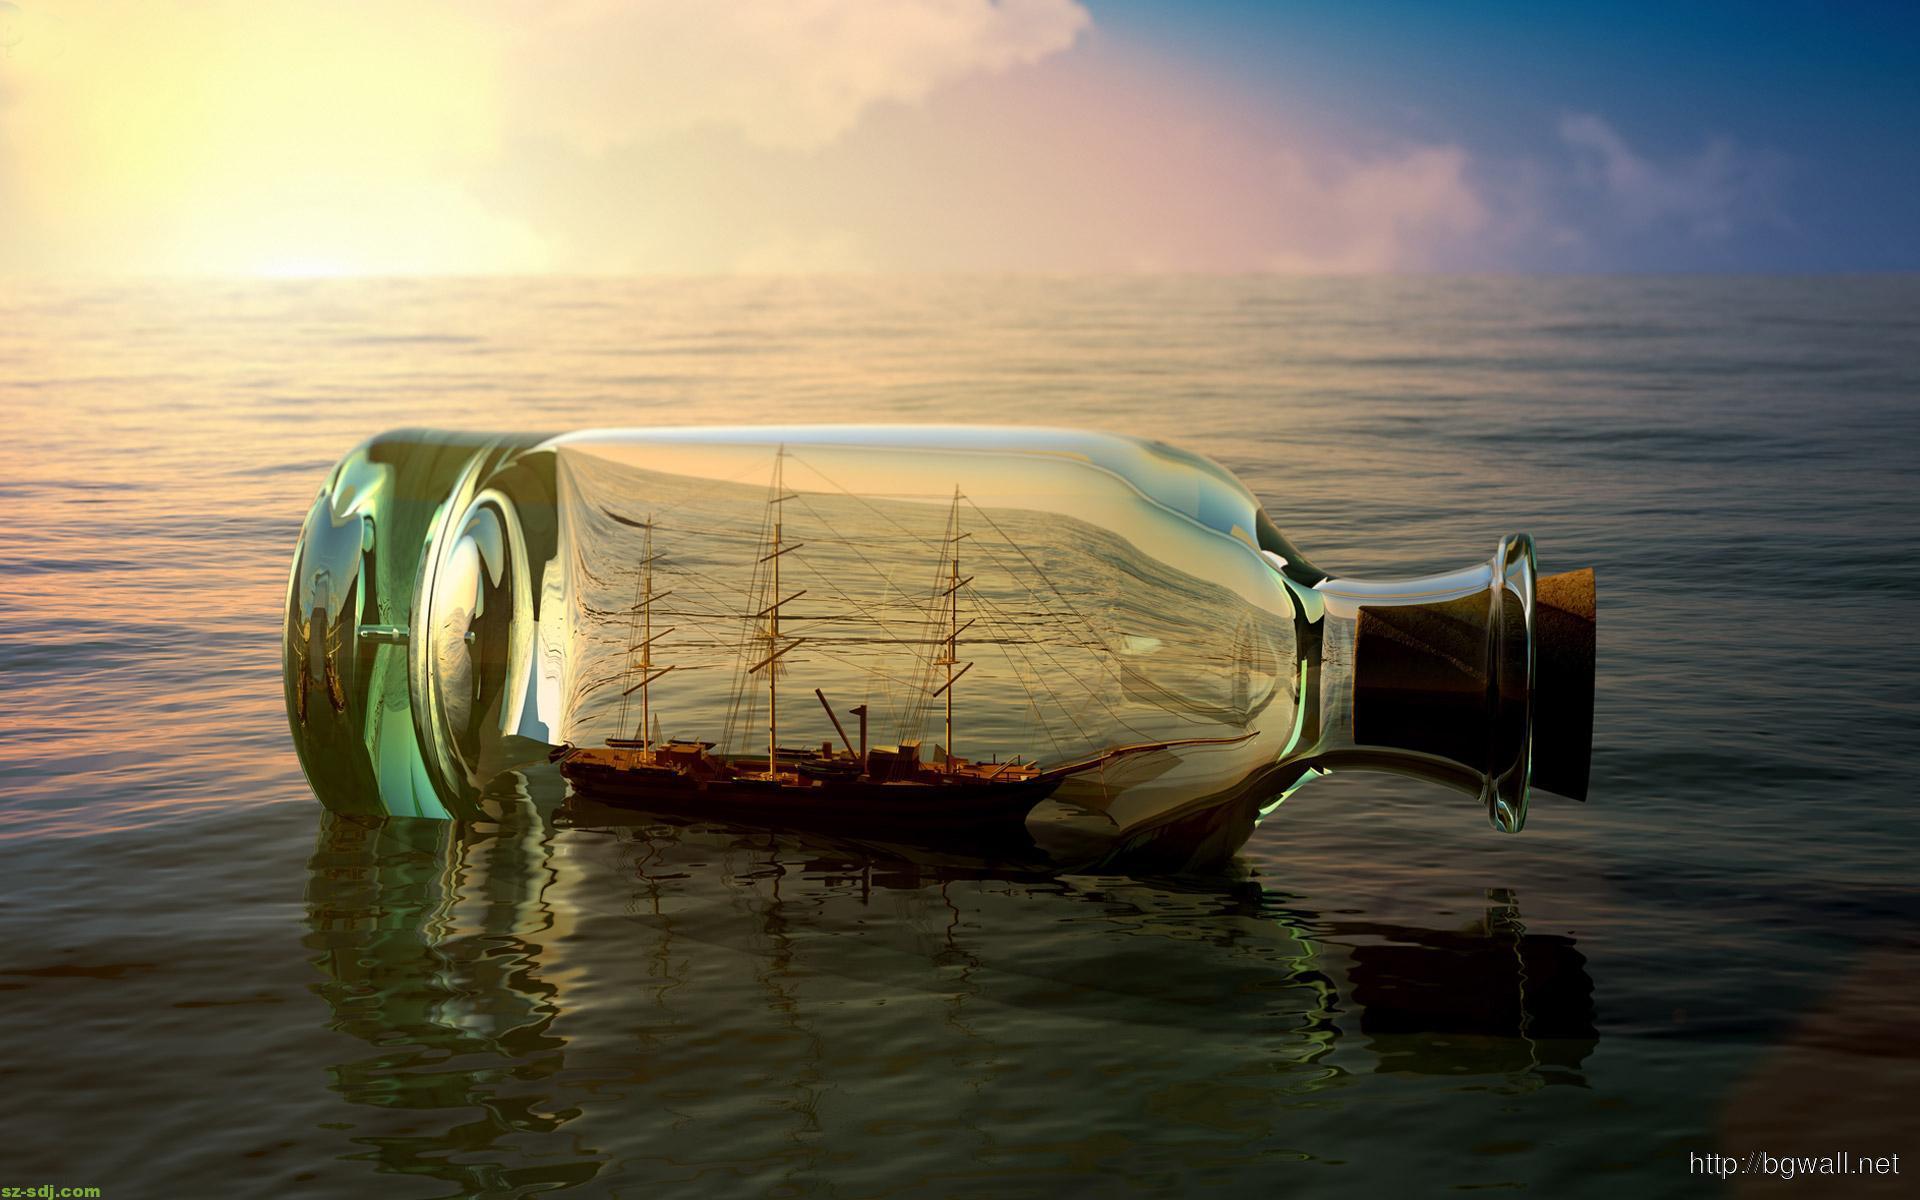 Rain Drop Wallpaper Hd 3d Art Bottle At Sea Wallpaper Download Background